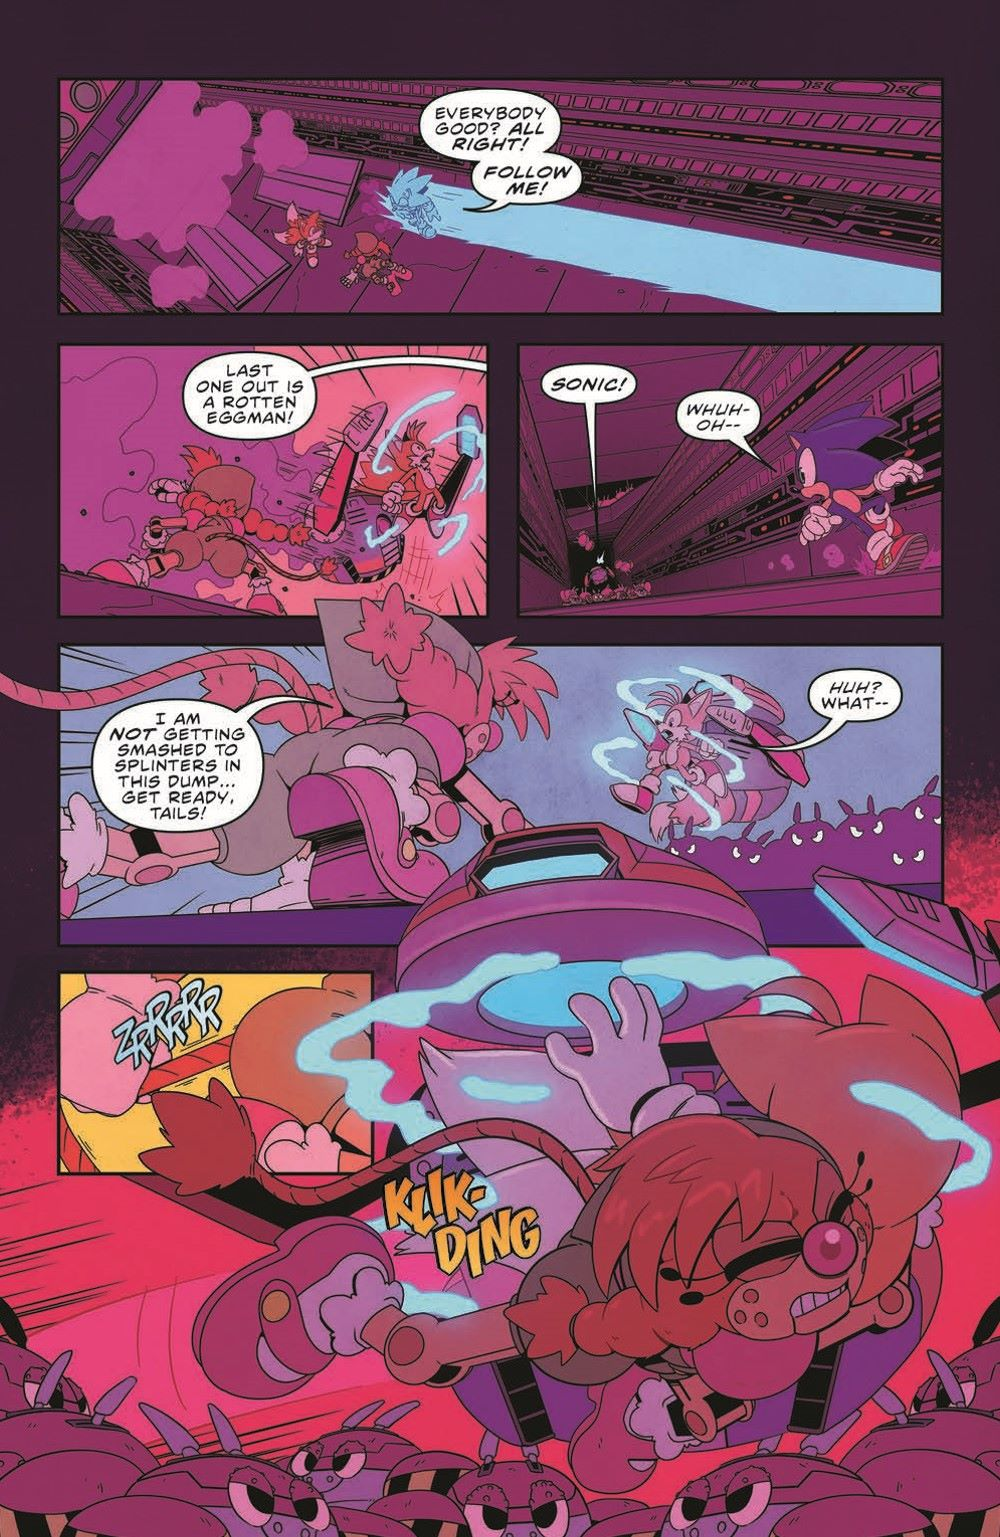 STH35_pr-5 ComicList Previews: SONIC THE HEDGEHOG #35